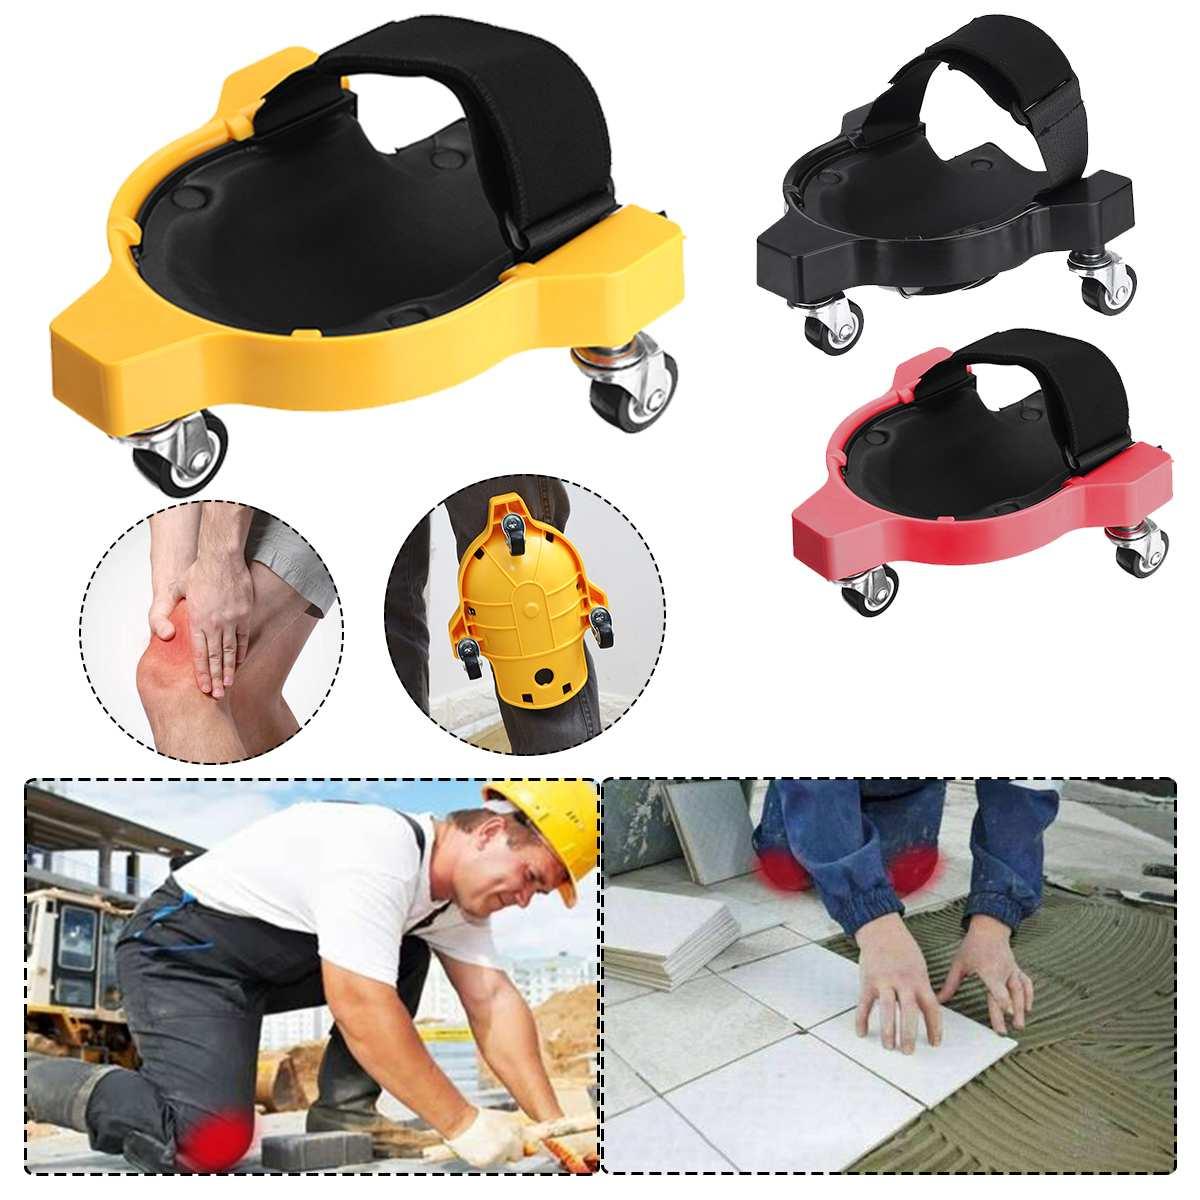 Plastic Knee Pad Rolling Wheels Adjustable Strap Knee Pad Rolling Wheels Protecting Knee Sports Knee Protection Pad Flexible